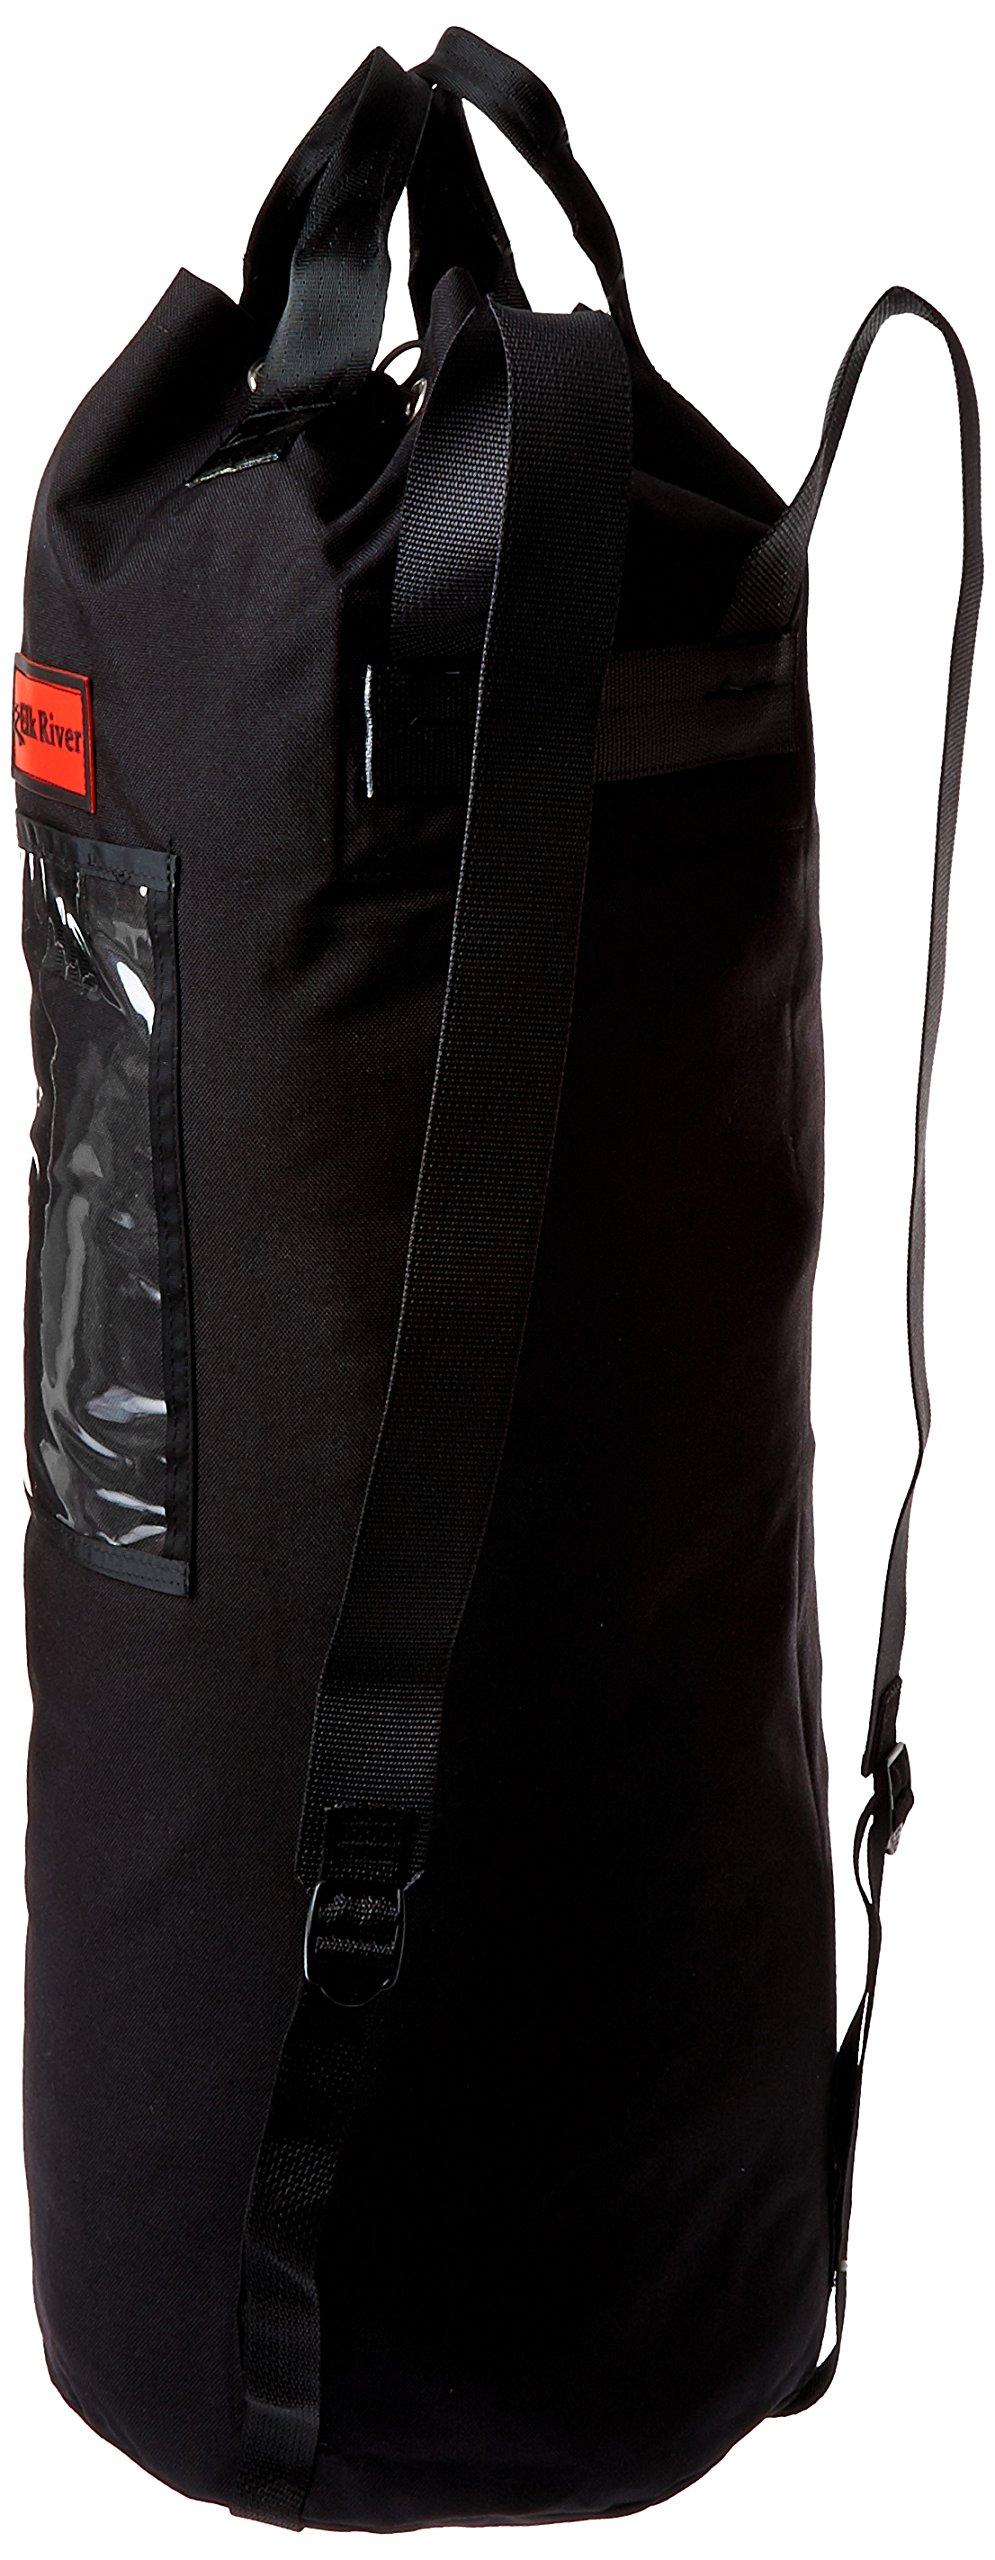 Elk River 84311 EZE-Man Nylon Rope Bag with Drawstring Closure, 12'' Width x 32'' Depth by Elk River (Image #2)